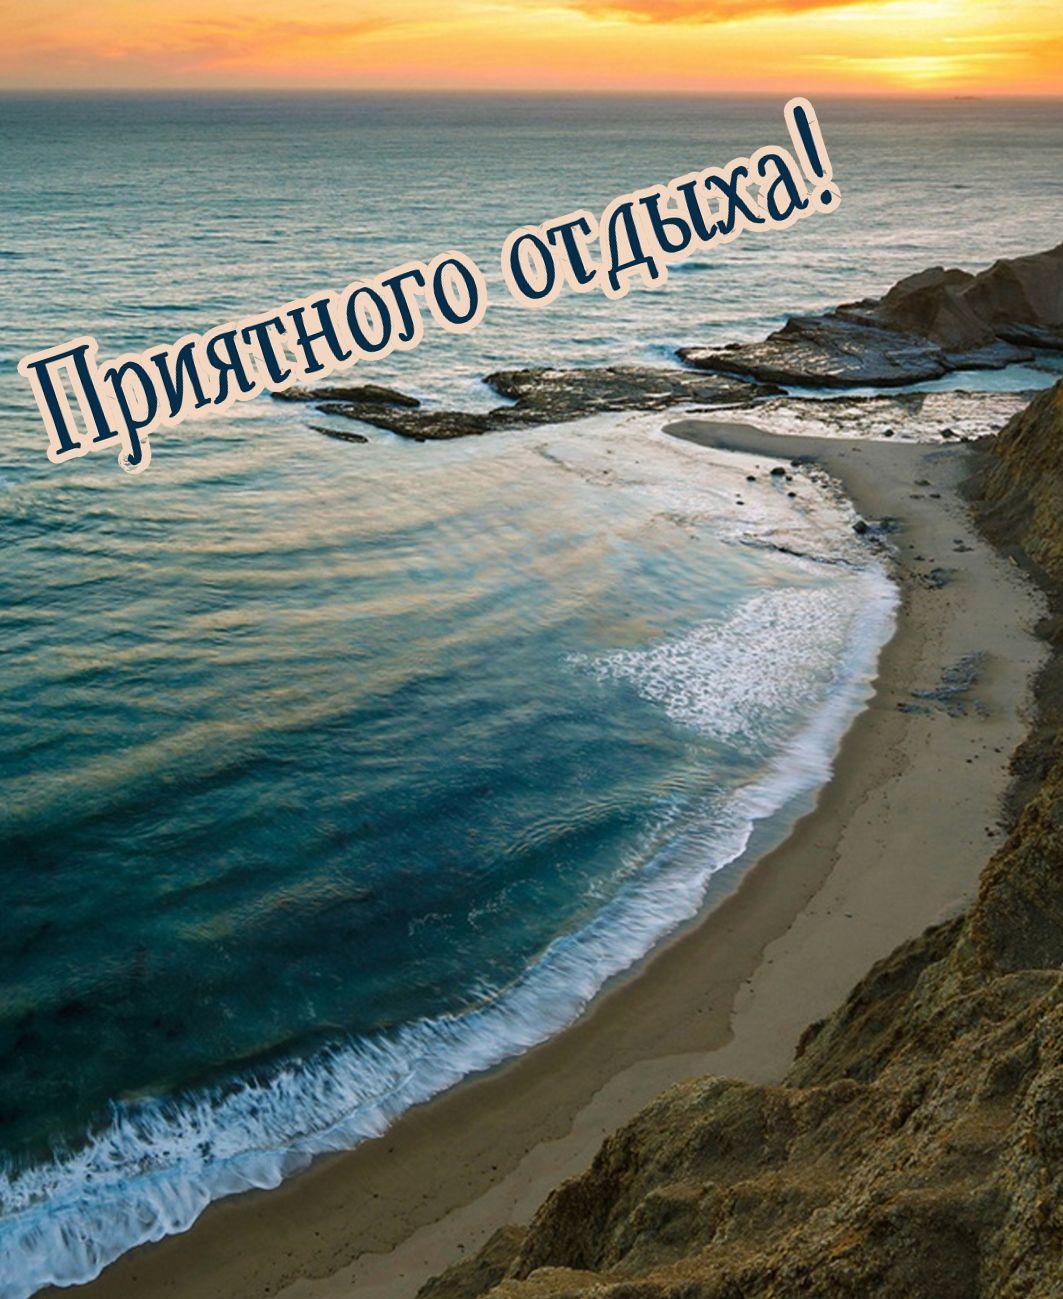 открытка с отпуском - приятного отдыха на берегу моря